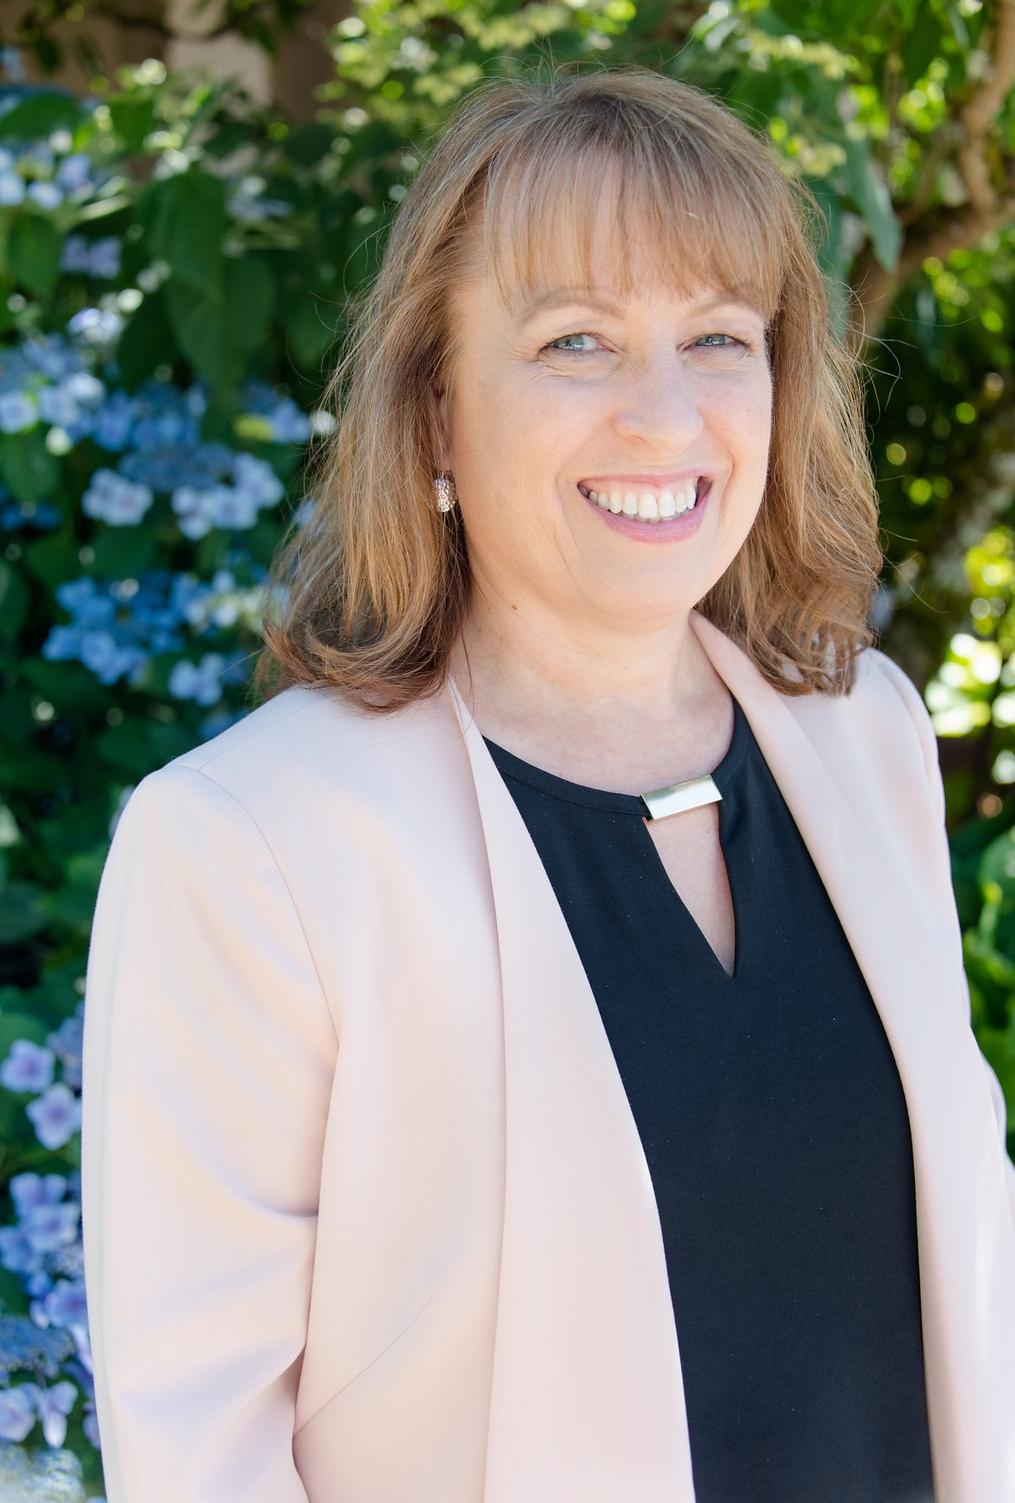 Cherie L. Baze, RN - Director of Nurses / Owner